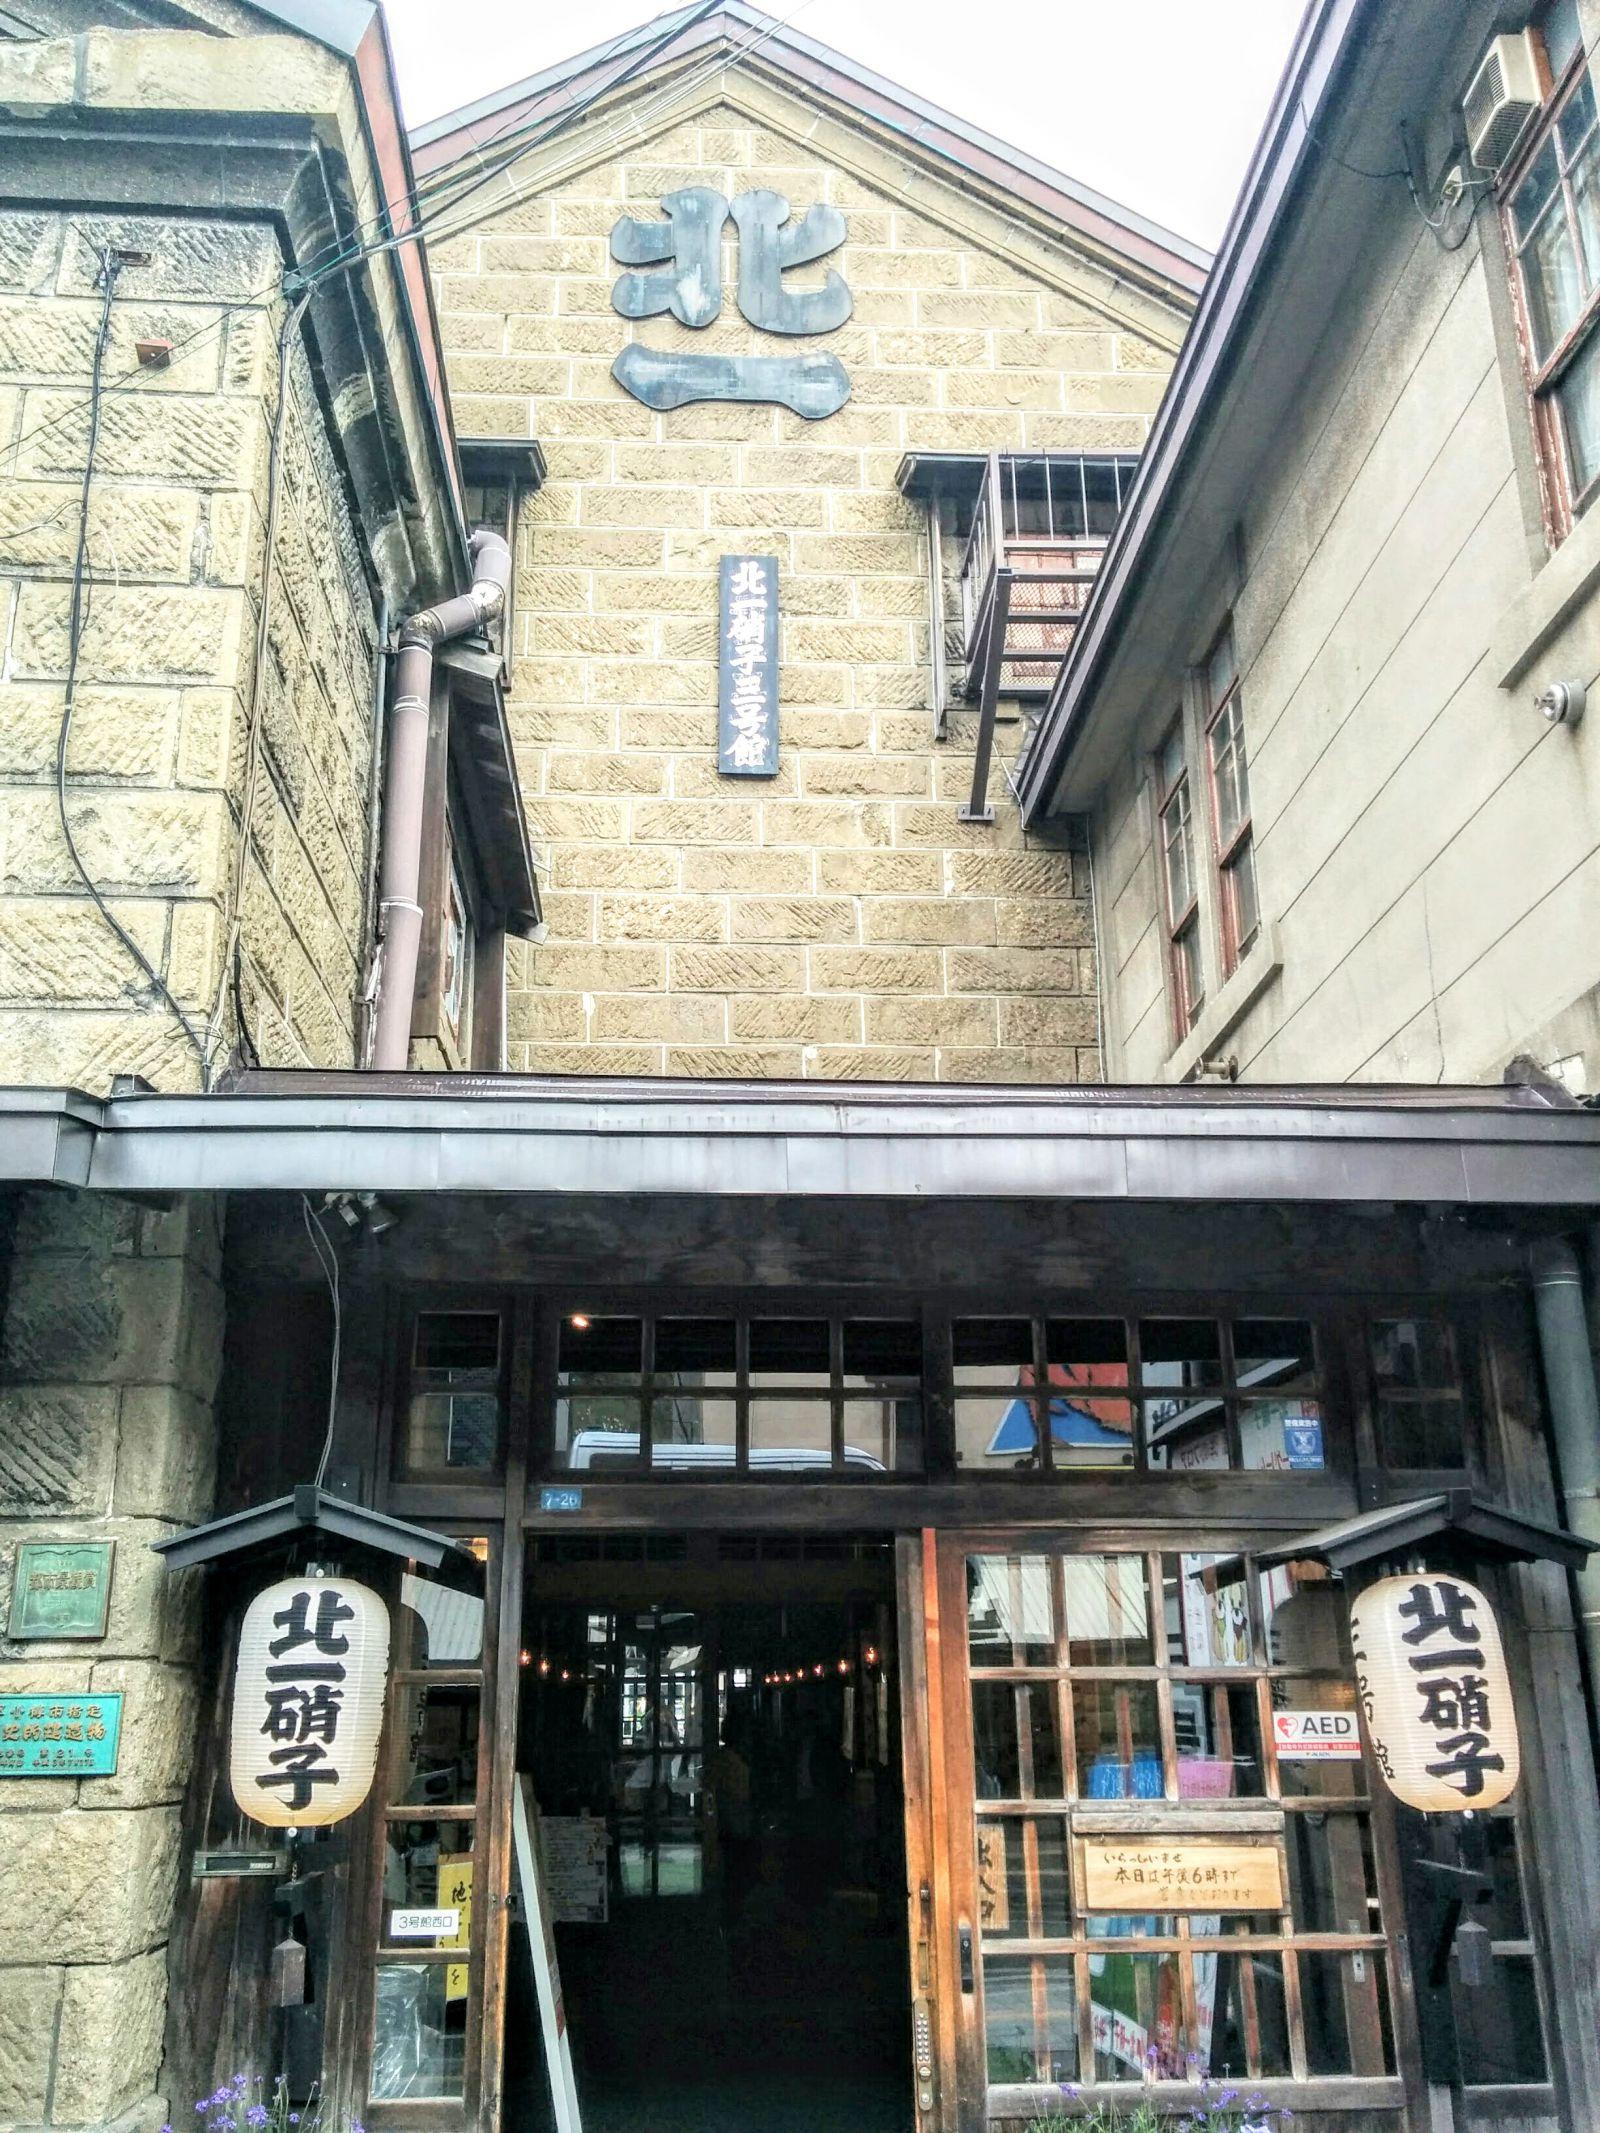 【小樽】小樽北一硝子周辺観光写真です。